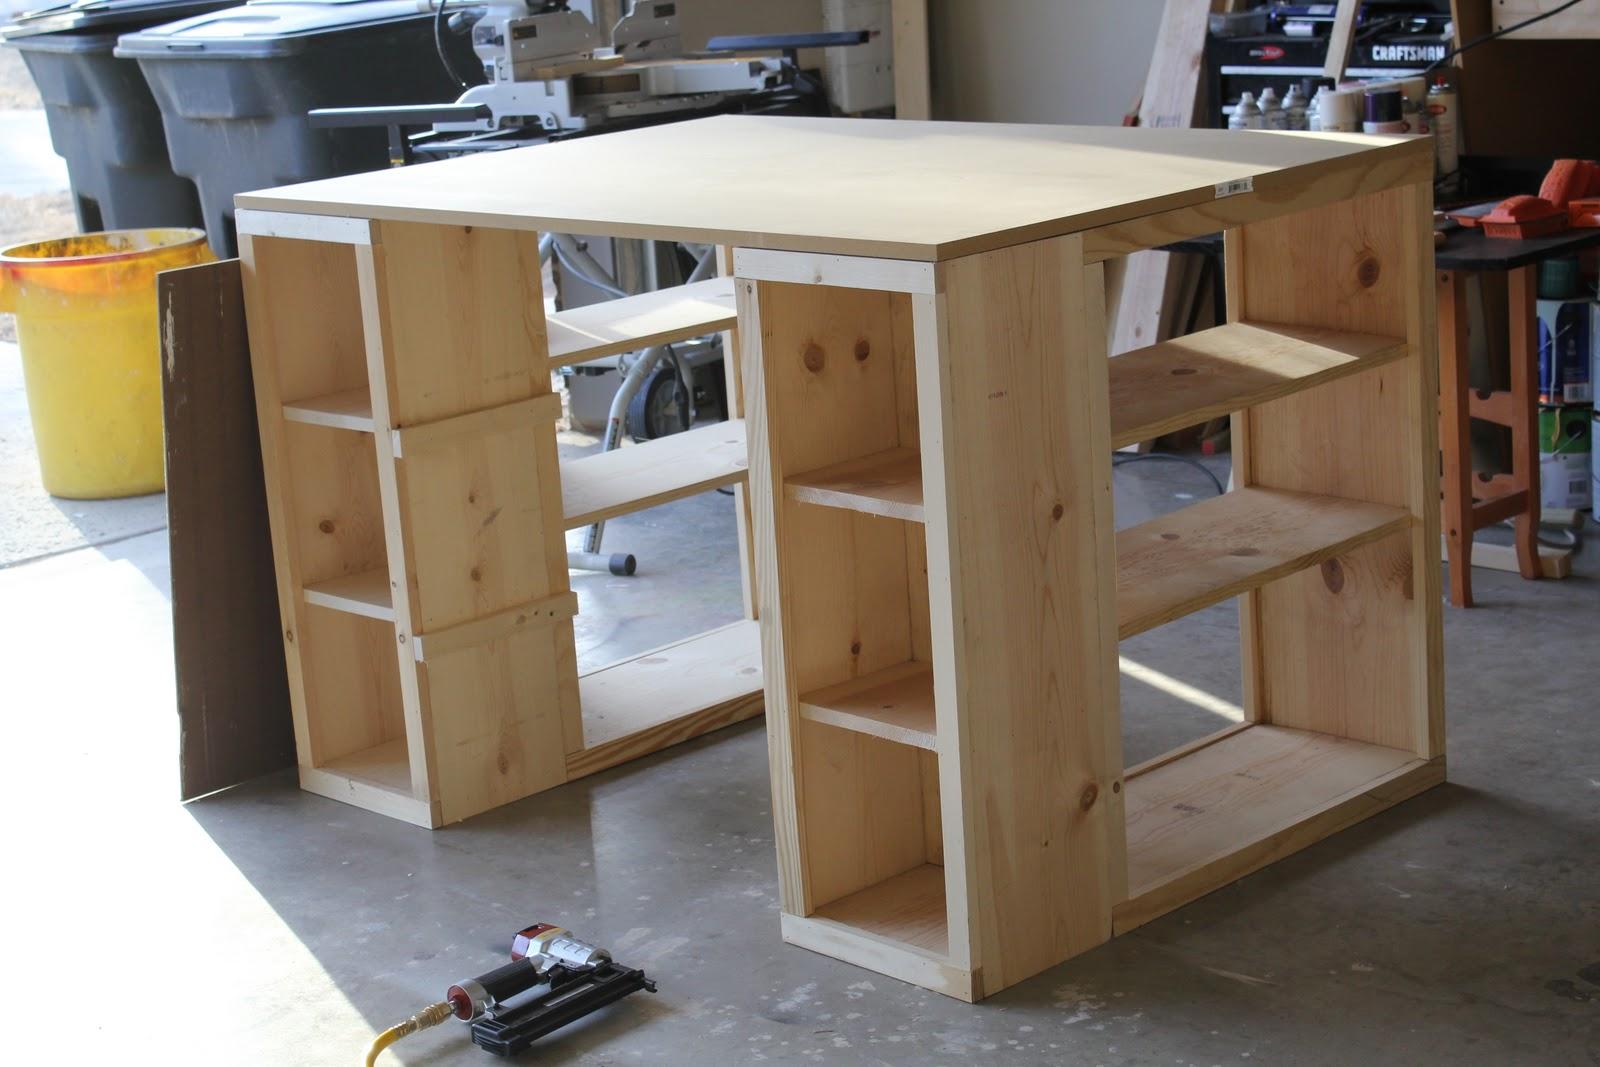 Make your own craft table - Make Your Own Craft Table 3